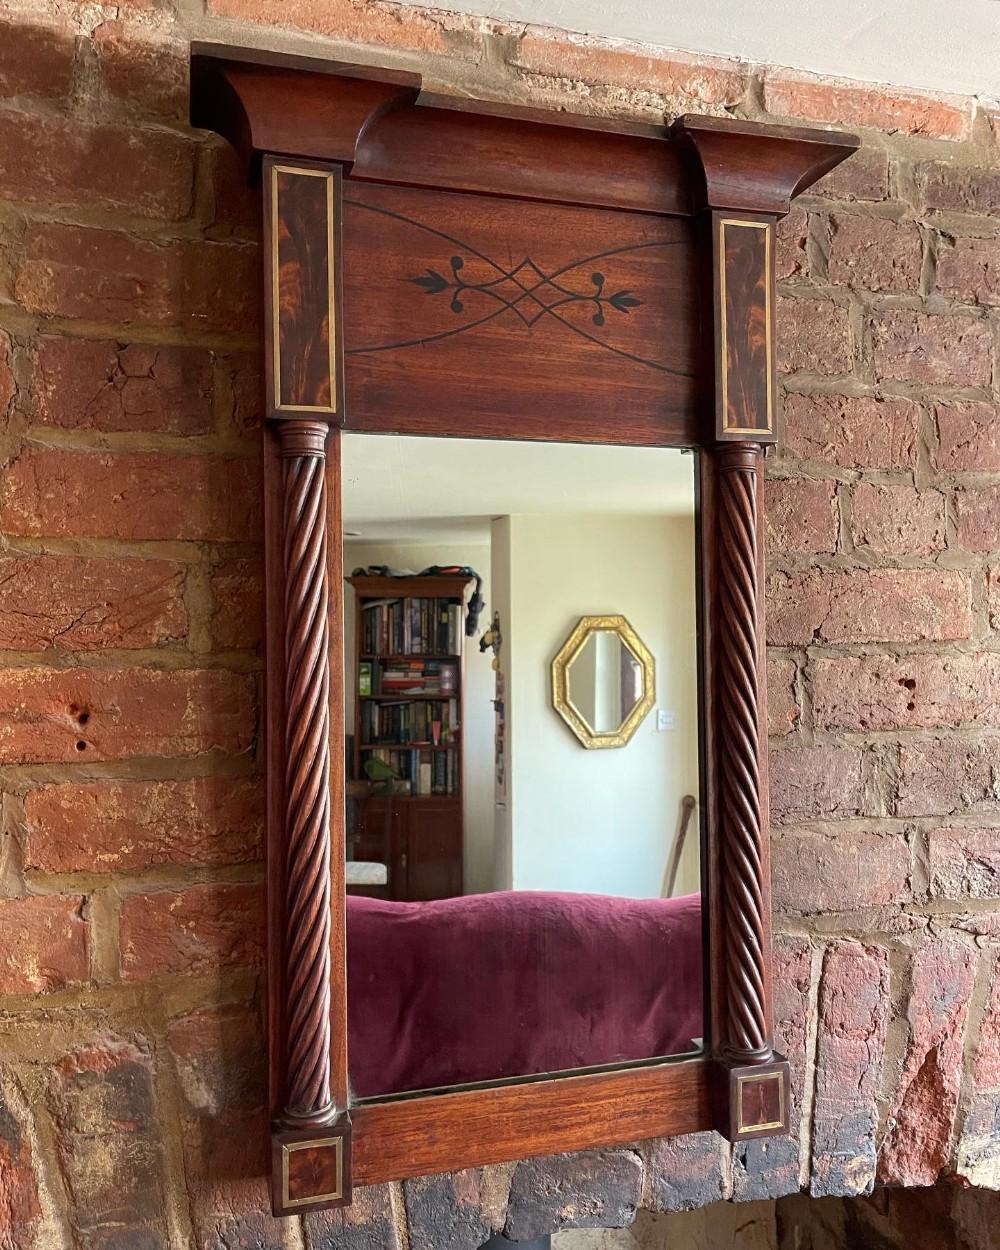 regency period pier mirror